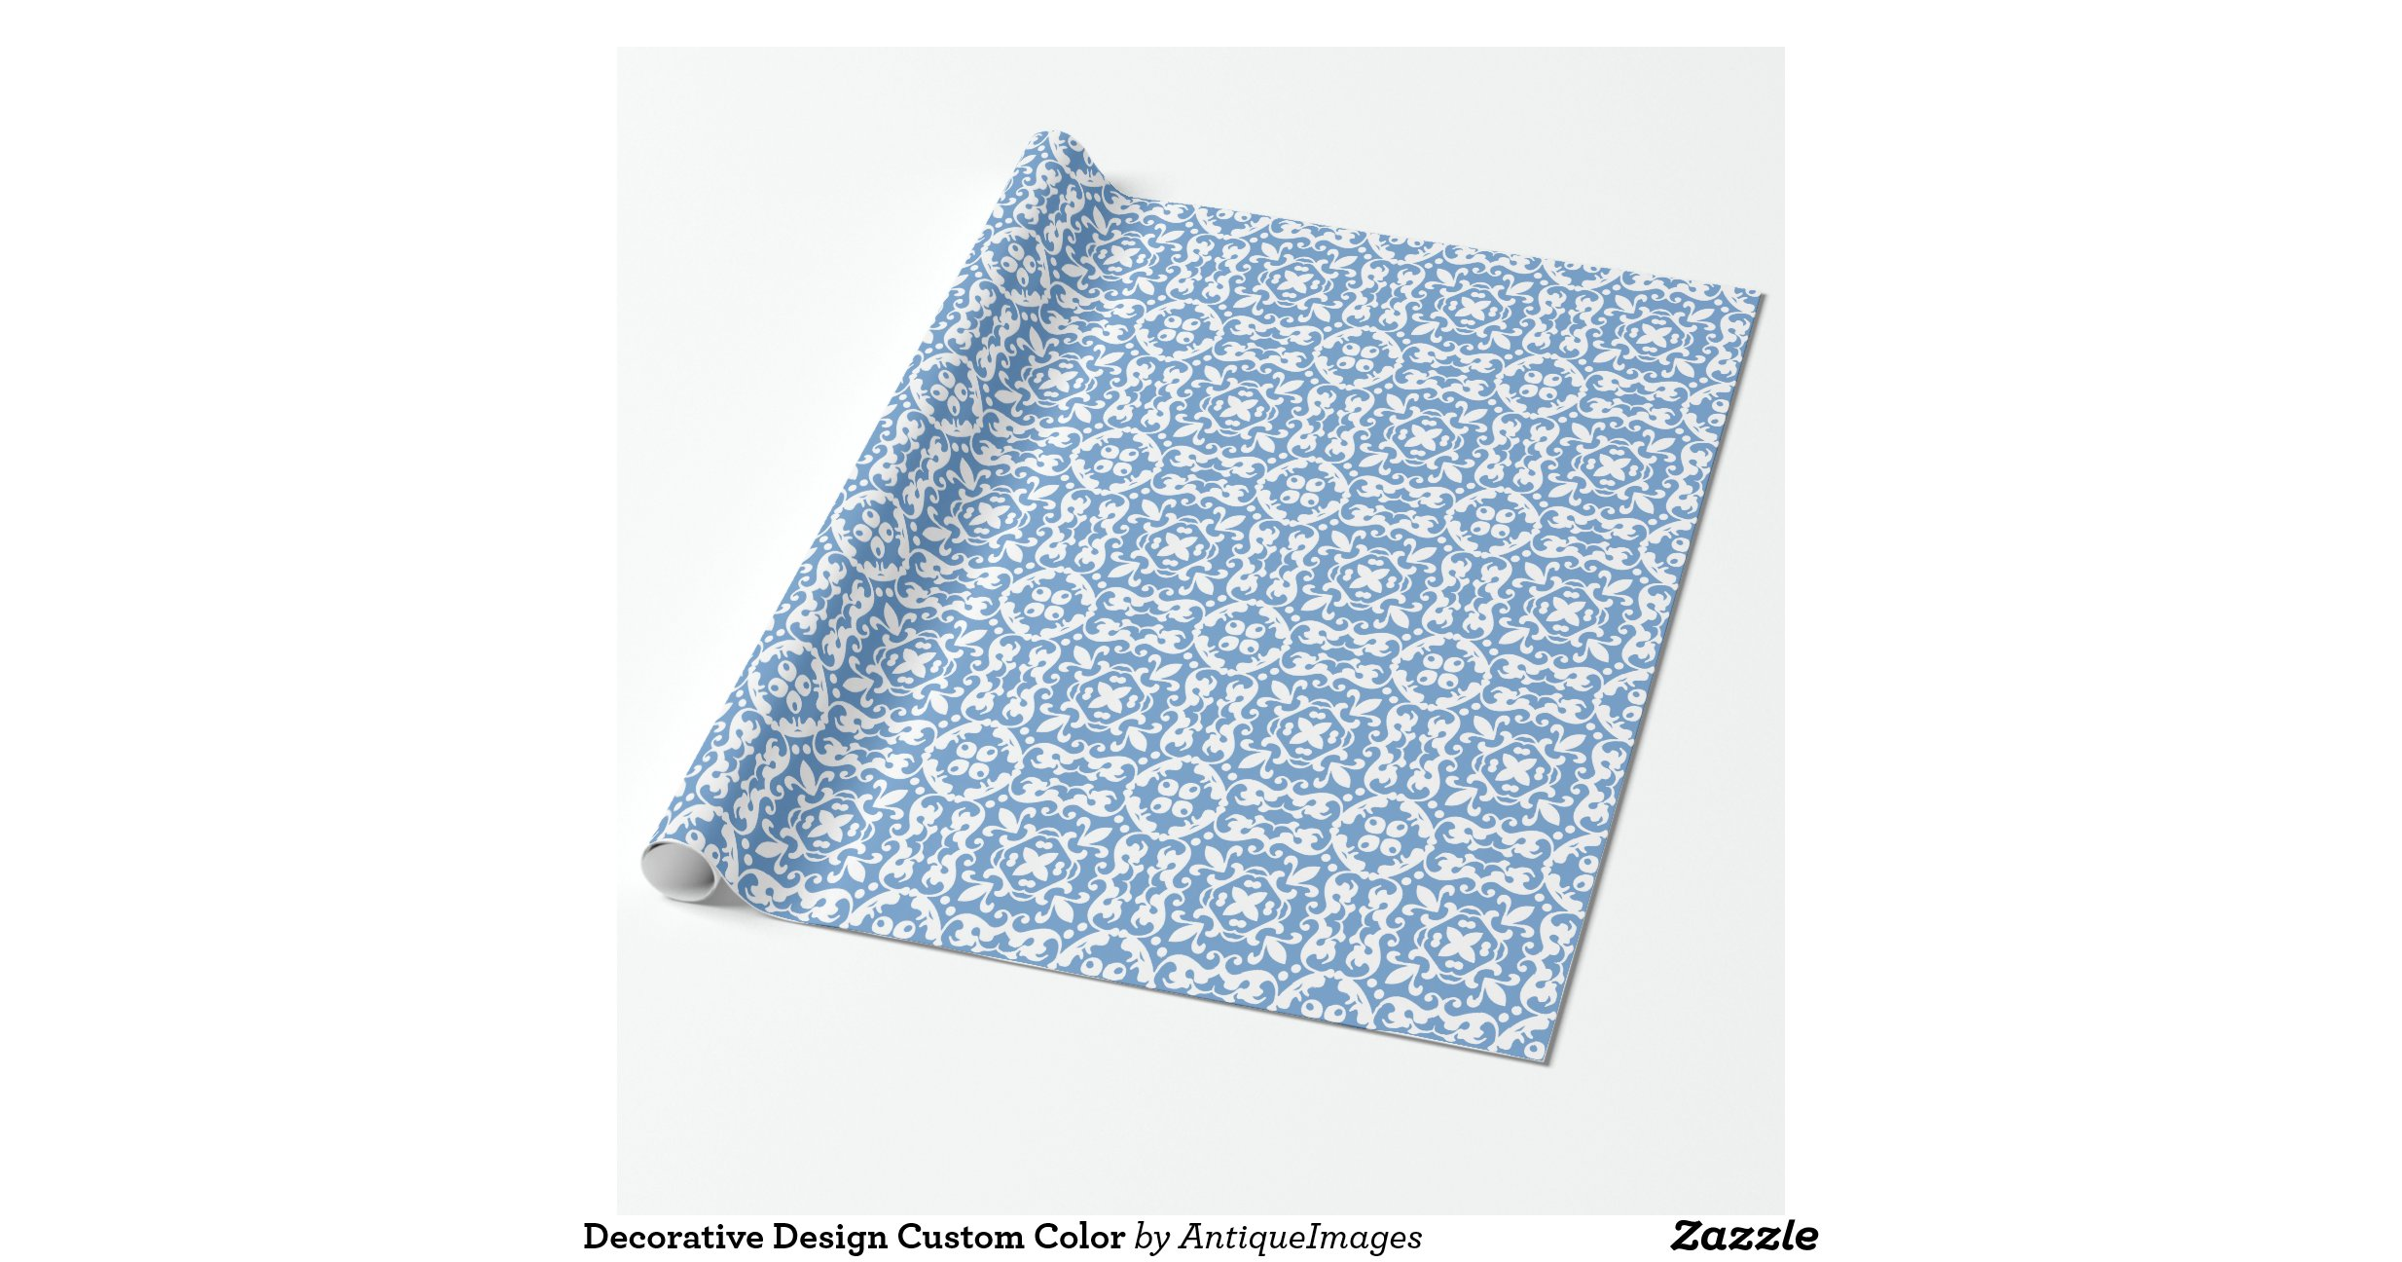 Decorative design custom color wrapping paper